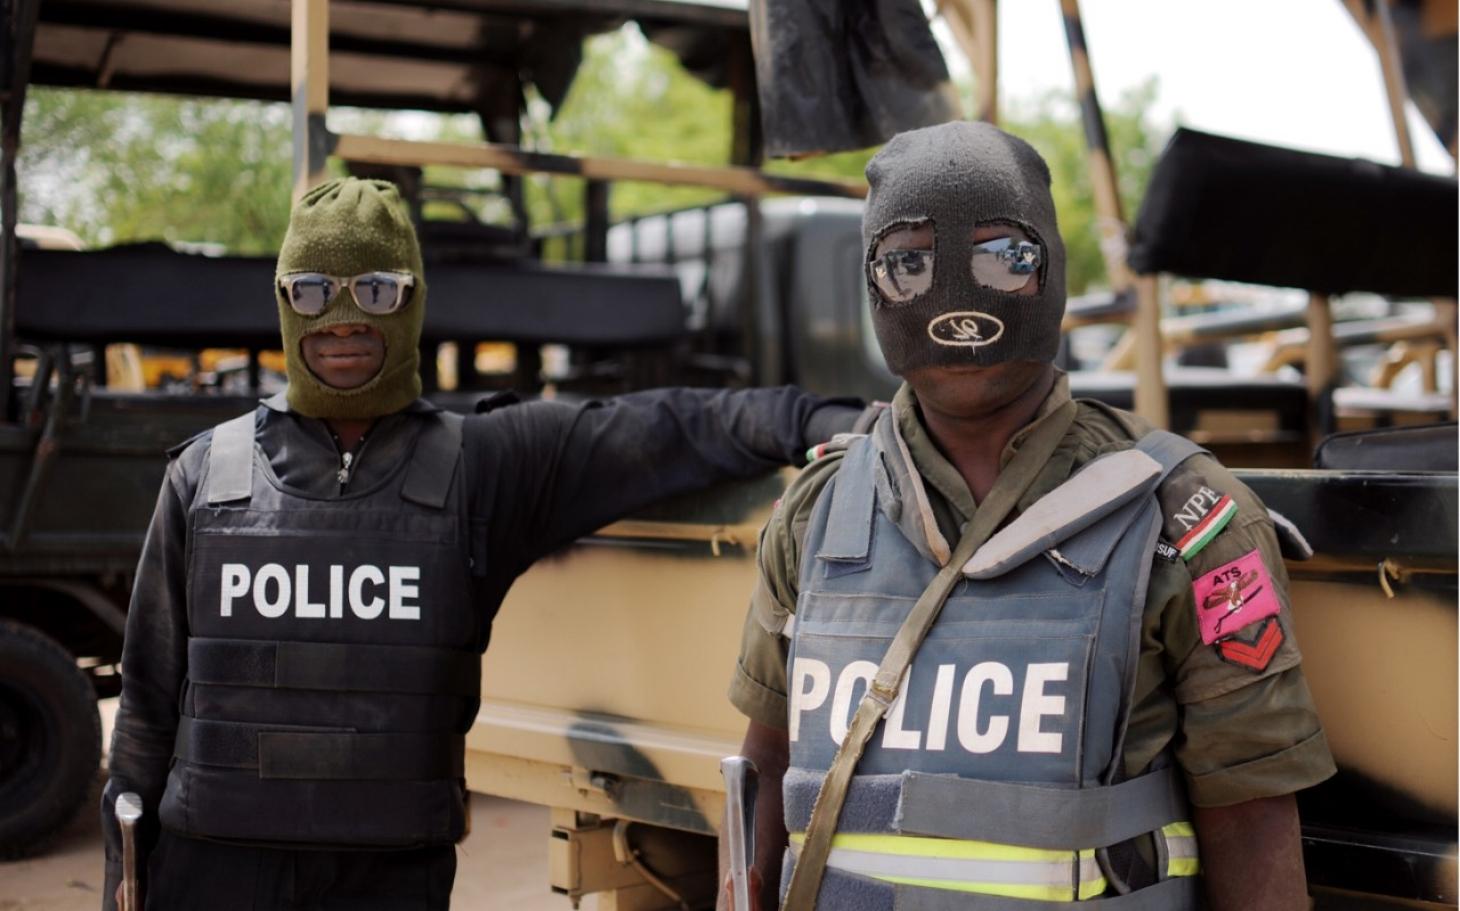 Fresh allegations against Nigeria′s military | Africa | DW.COM ...